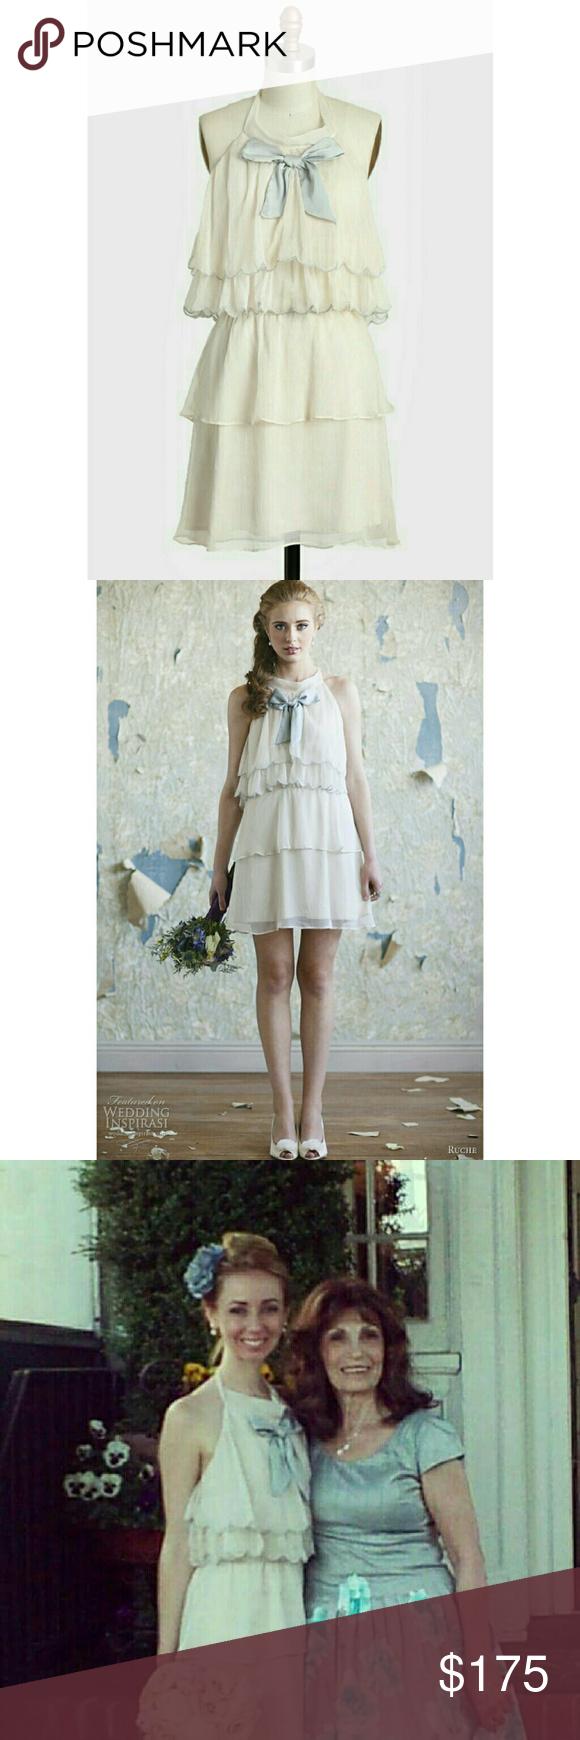 Cream colored vintage wedding dresses  Ruche gemma lyn vintage wedding dress  Baby blue wedding dresses